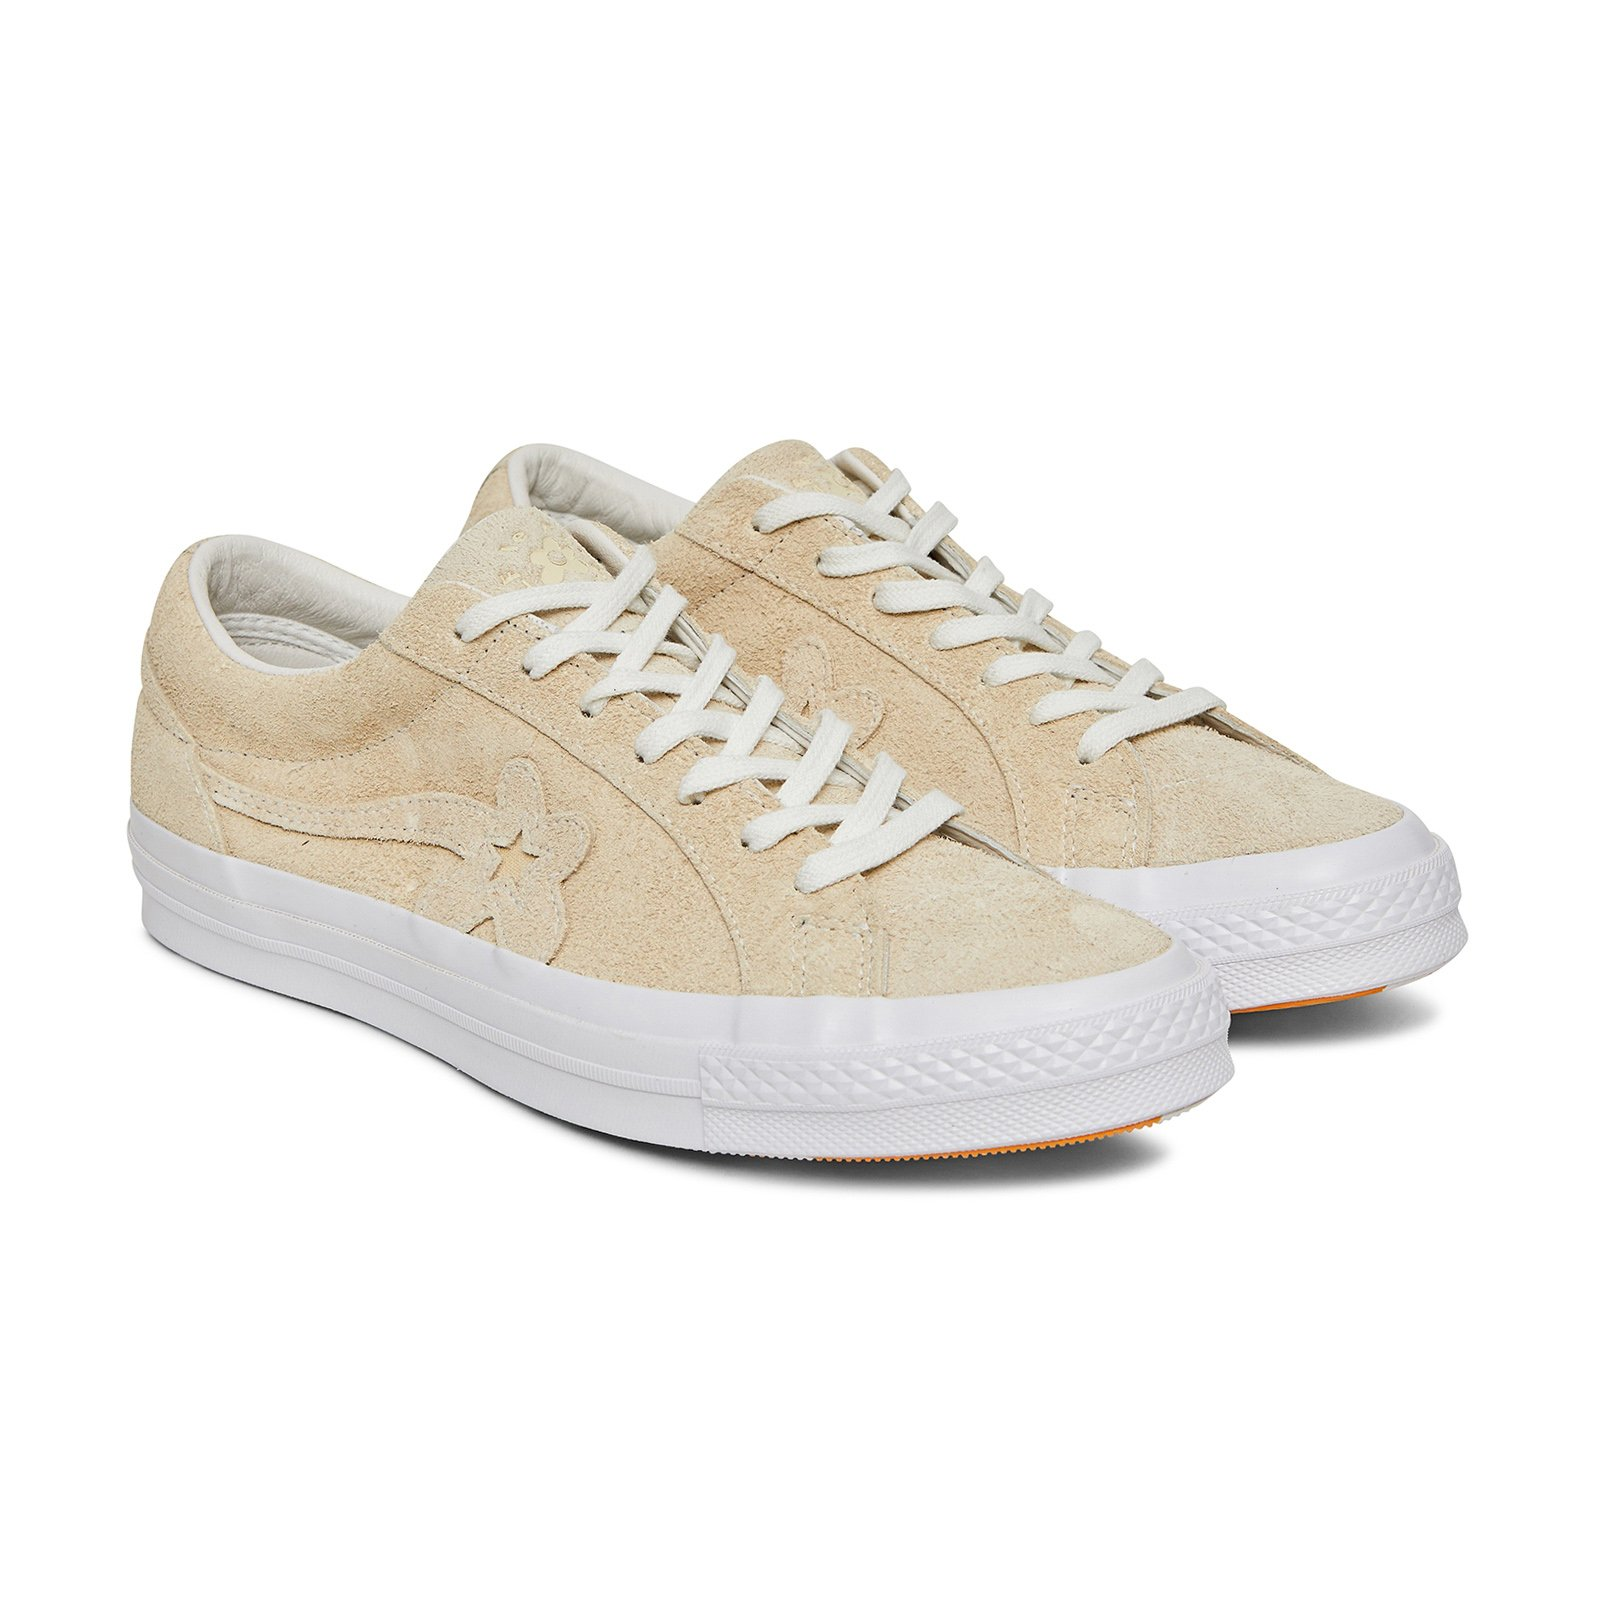 2101d6dd Very Goods | Converse Golf Le Fleur One Star SneakersSneakers - Slam Jam  Socialism